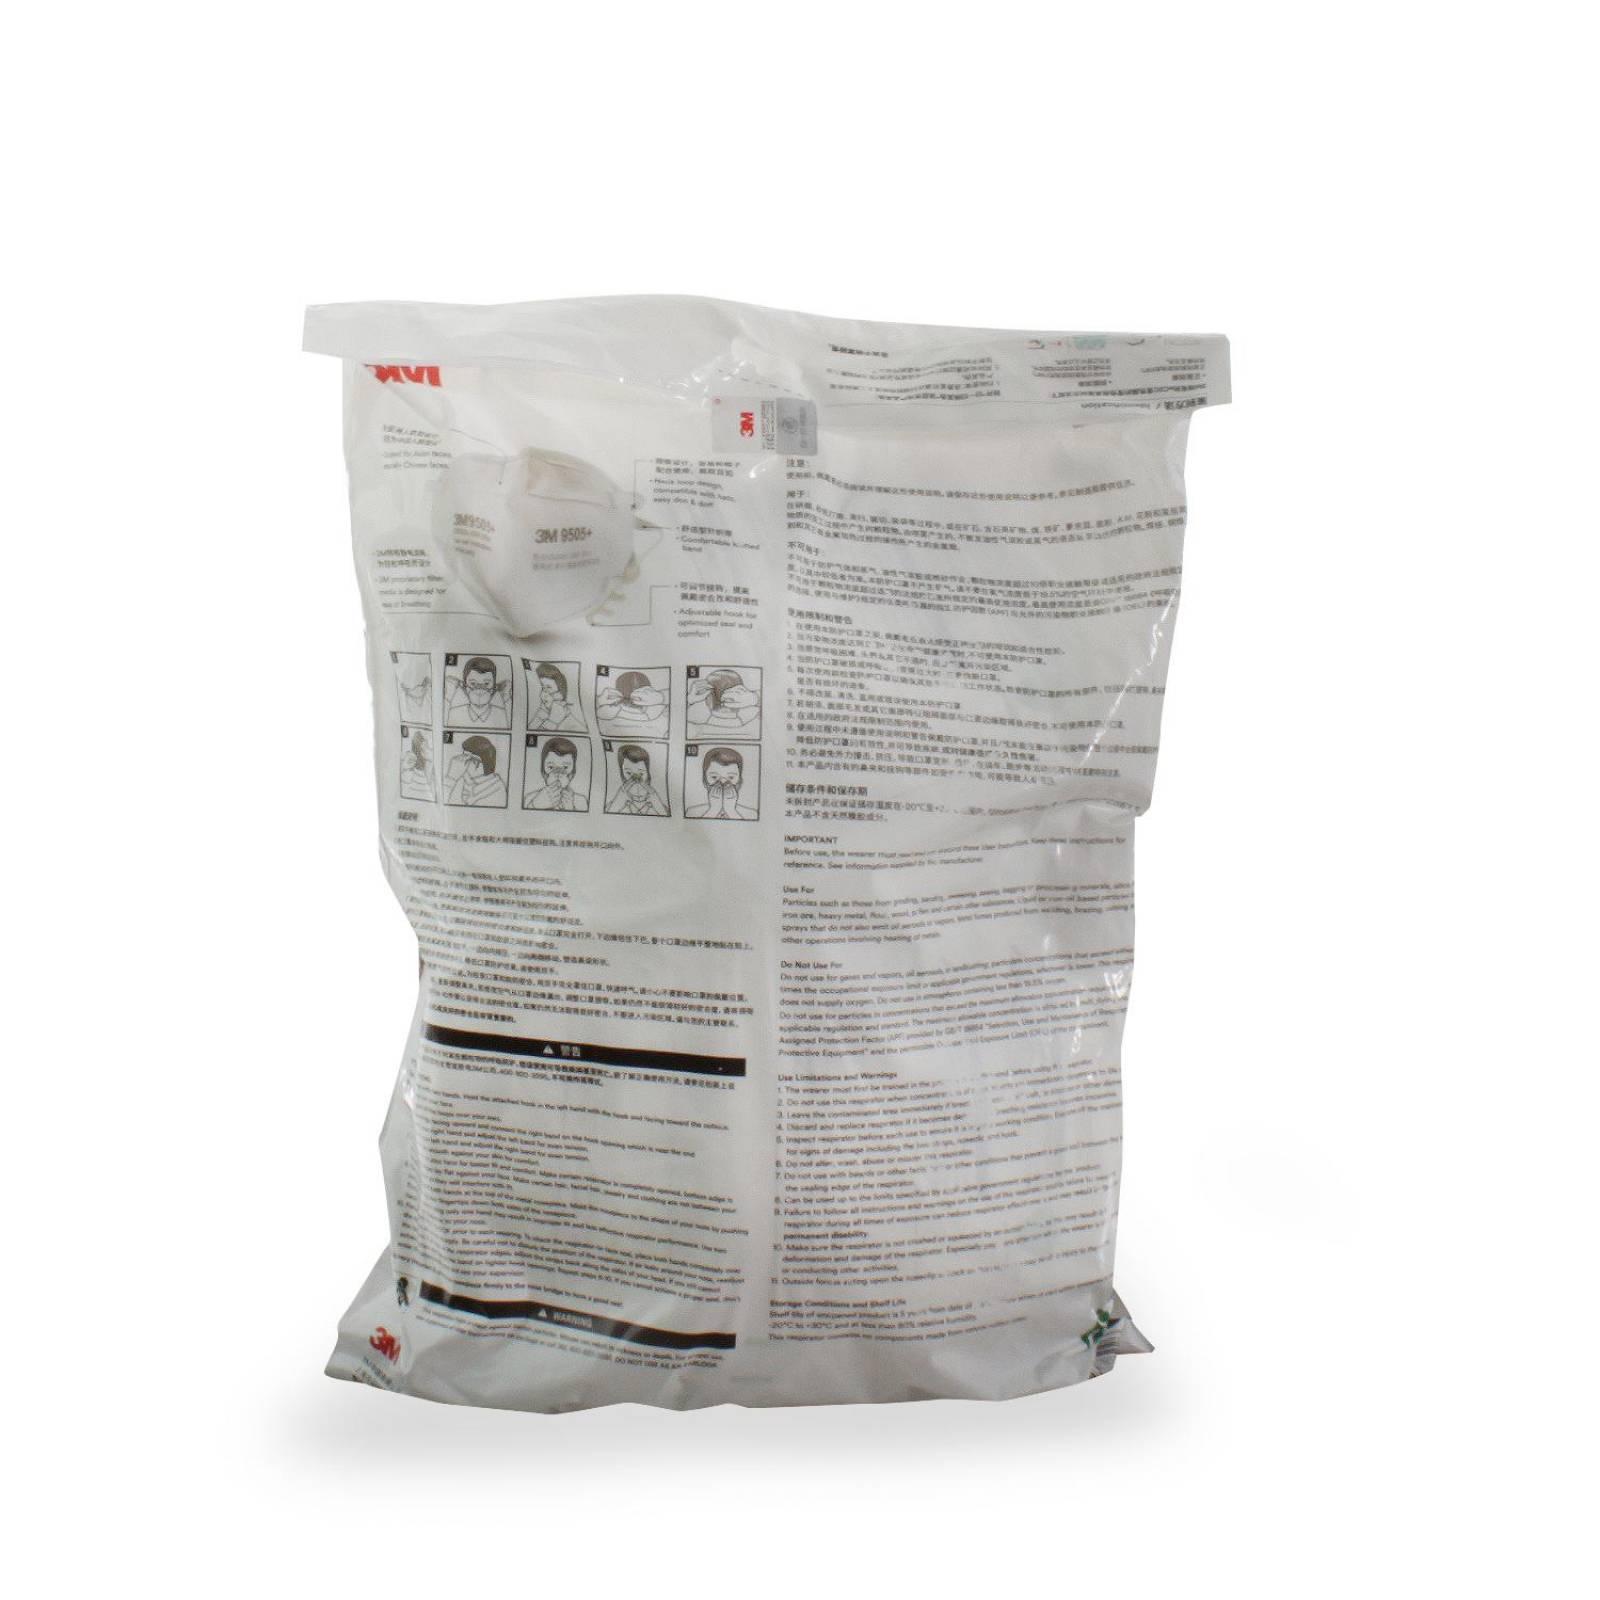 Cubrebocas 3M KN95 9505+ FDA Antibacterial Desechable - 50 pzs